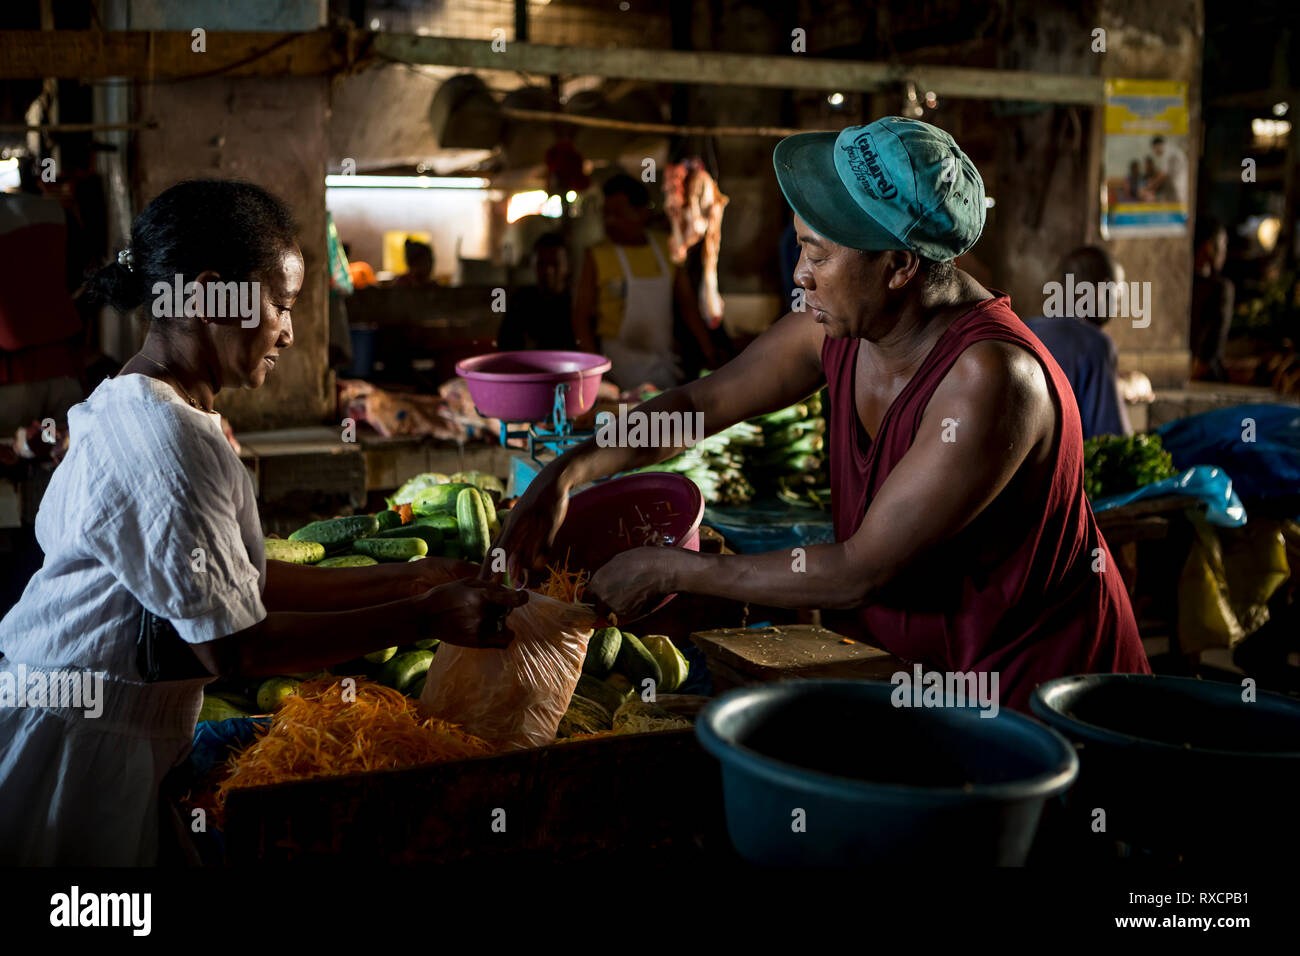 Greengrocery, market, Morondava, Madagascar - Stock Image